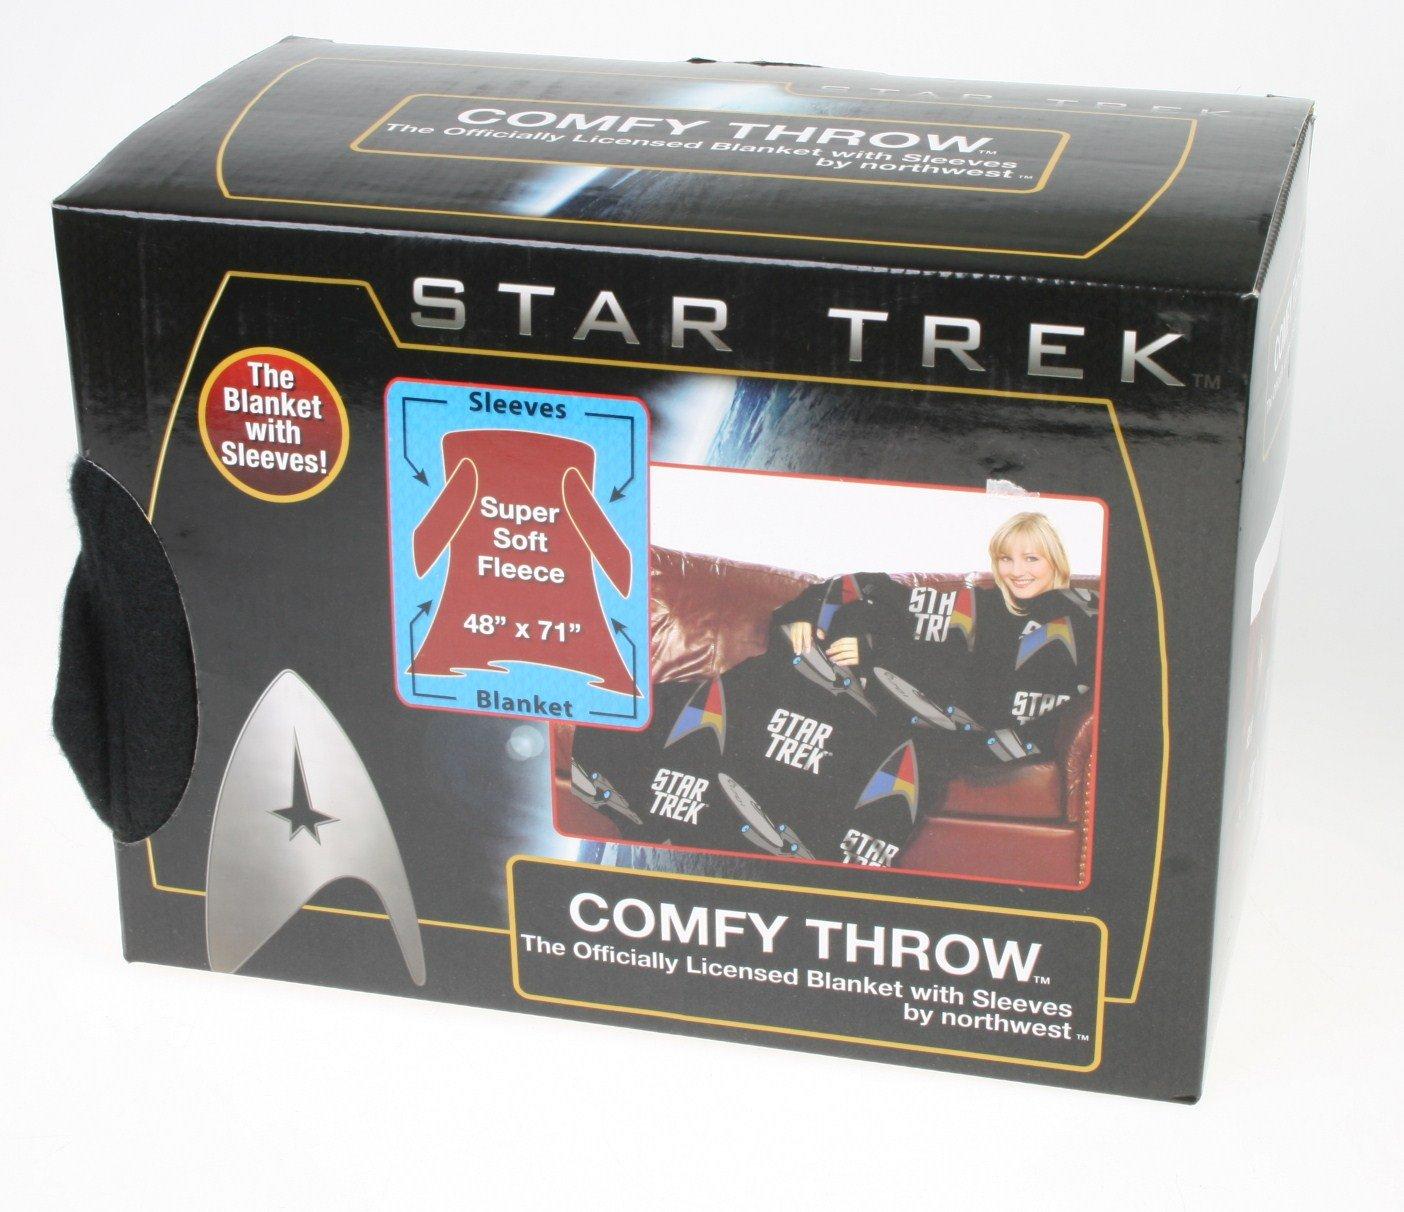 Northwest Star Trek Comfy Throw Blanket with Sleeves